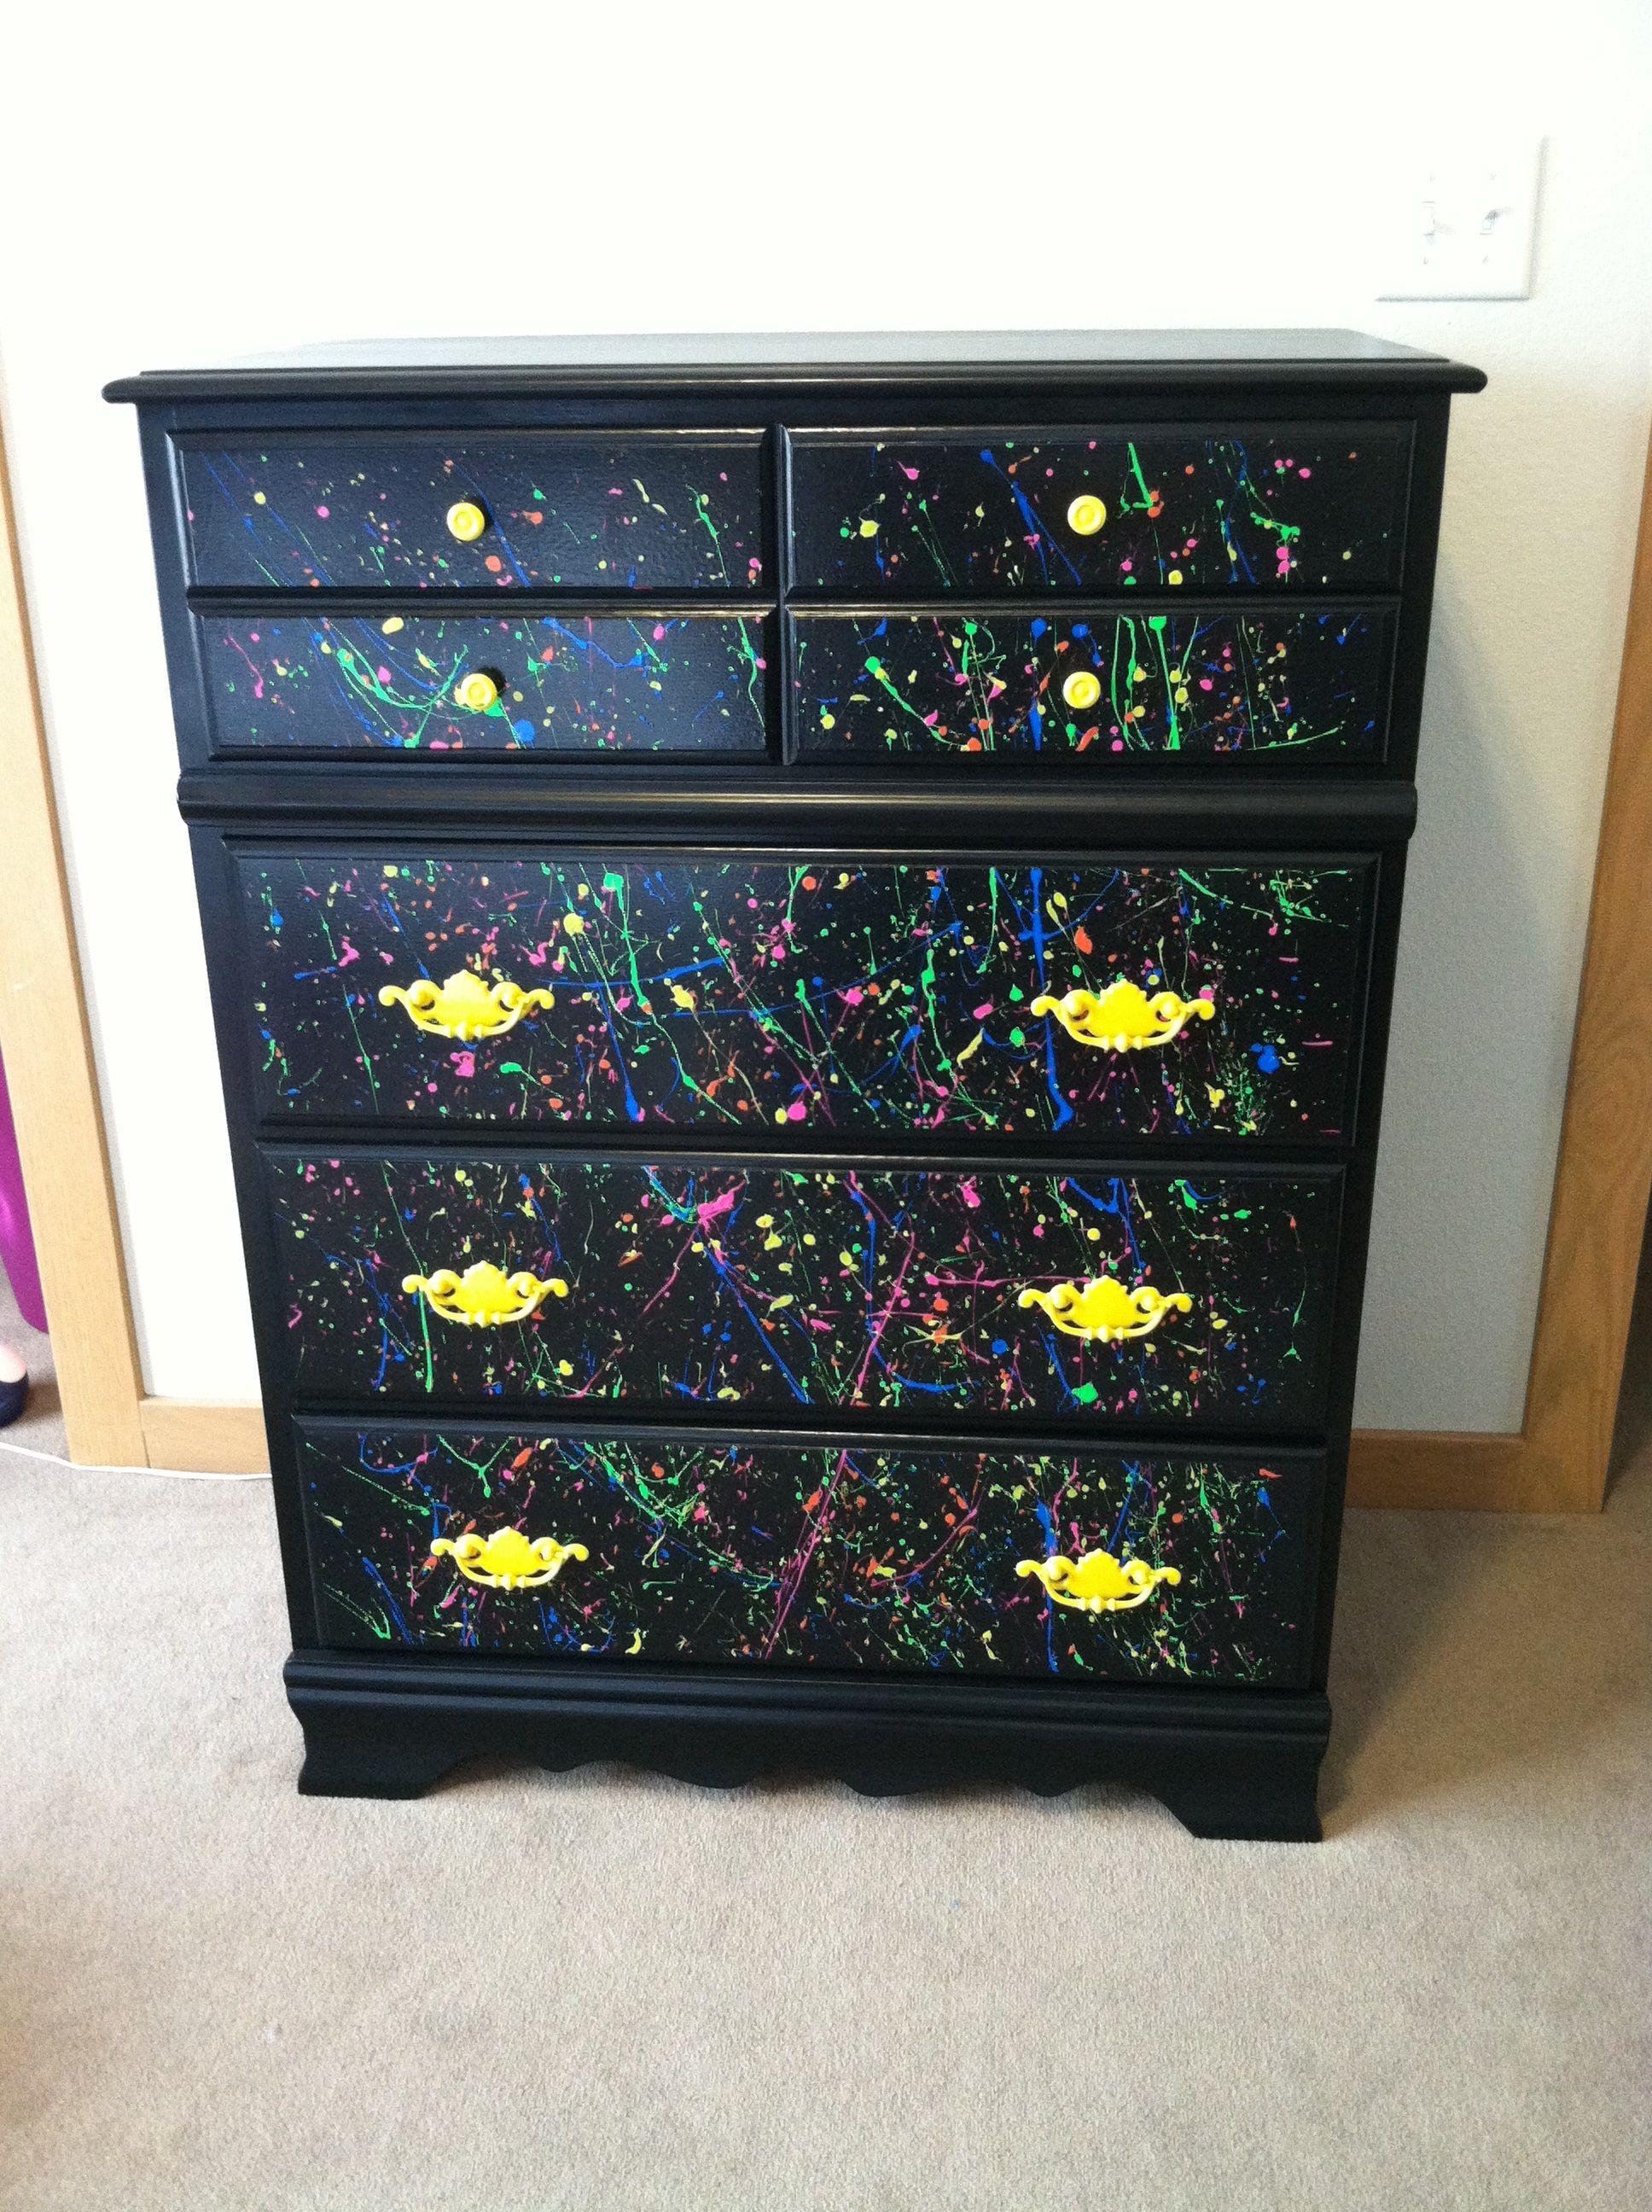 Painting Bedroom Furniture Black repainted white dresser to black, splatter paint for my teen